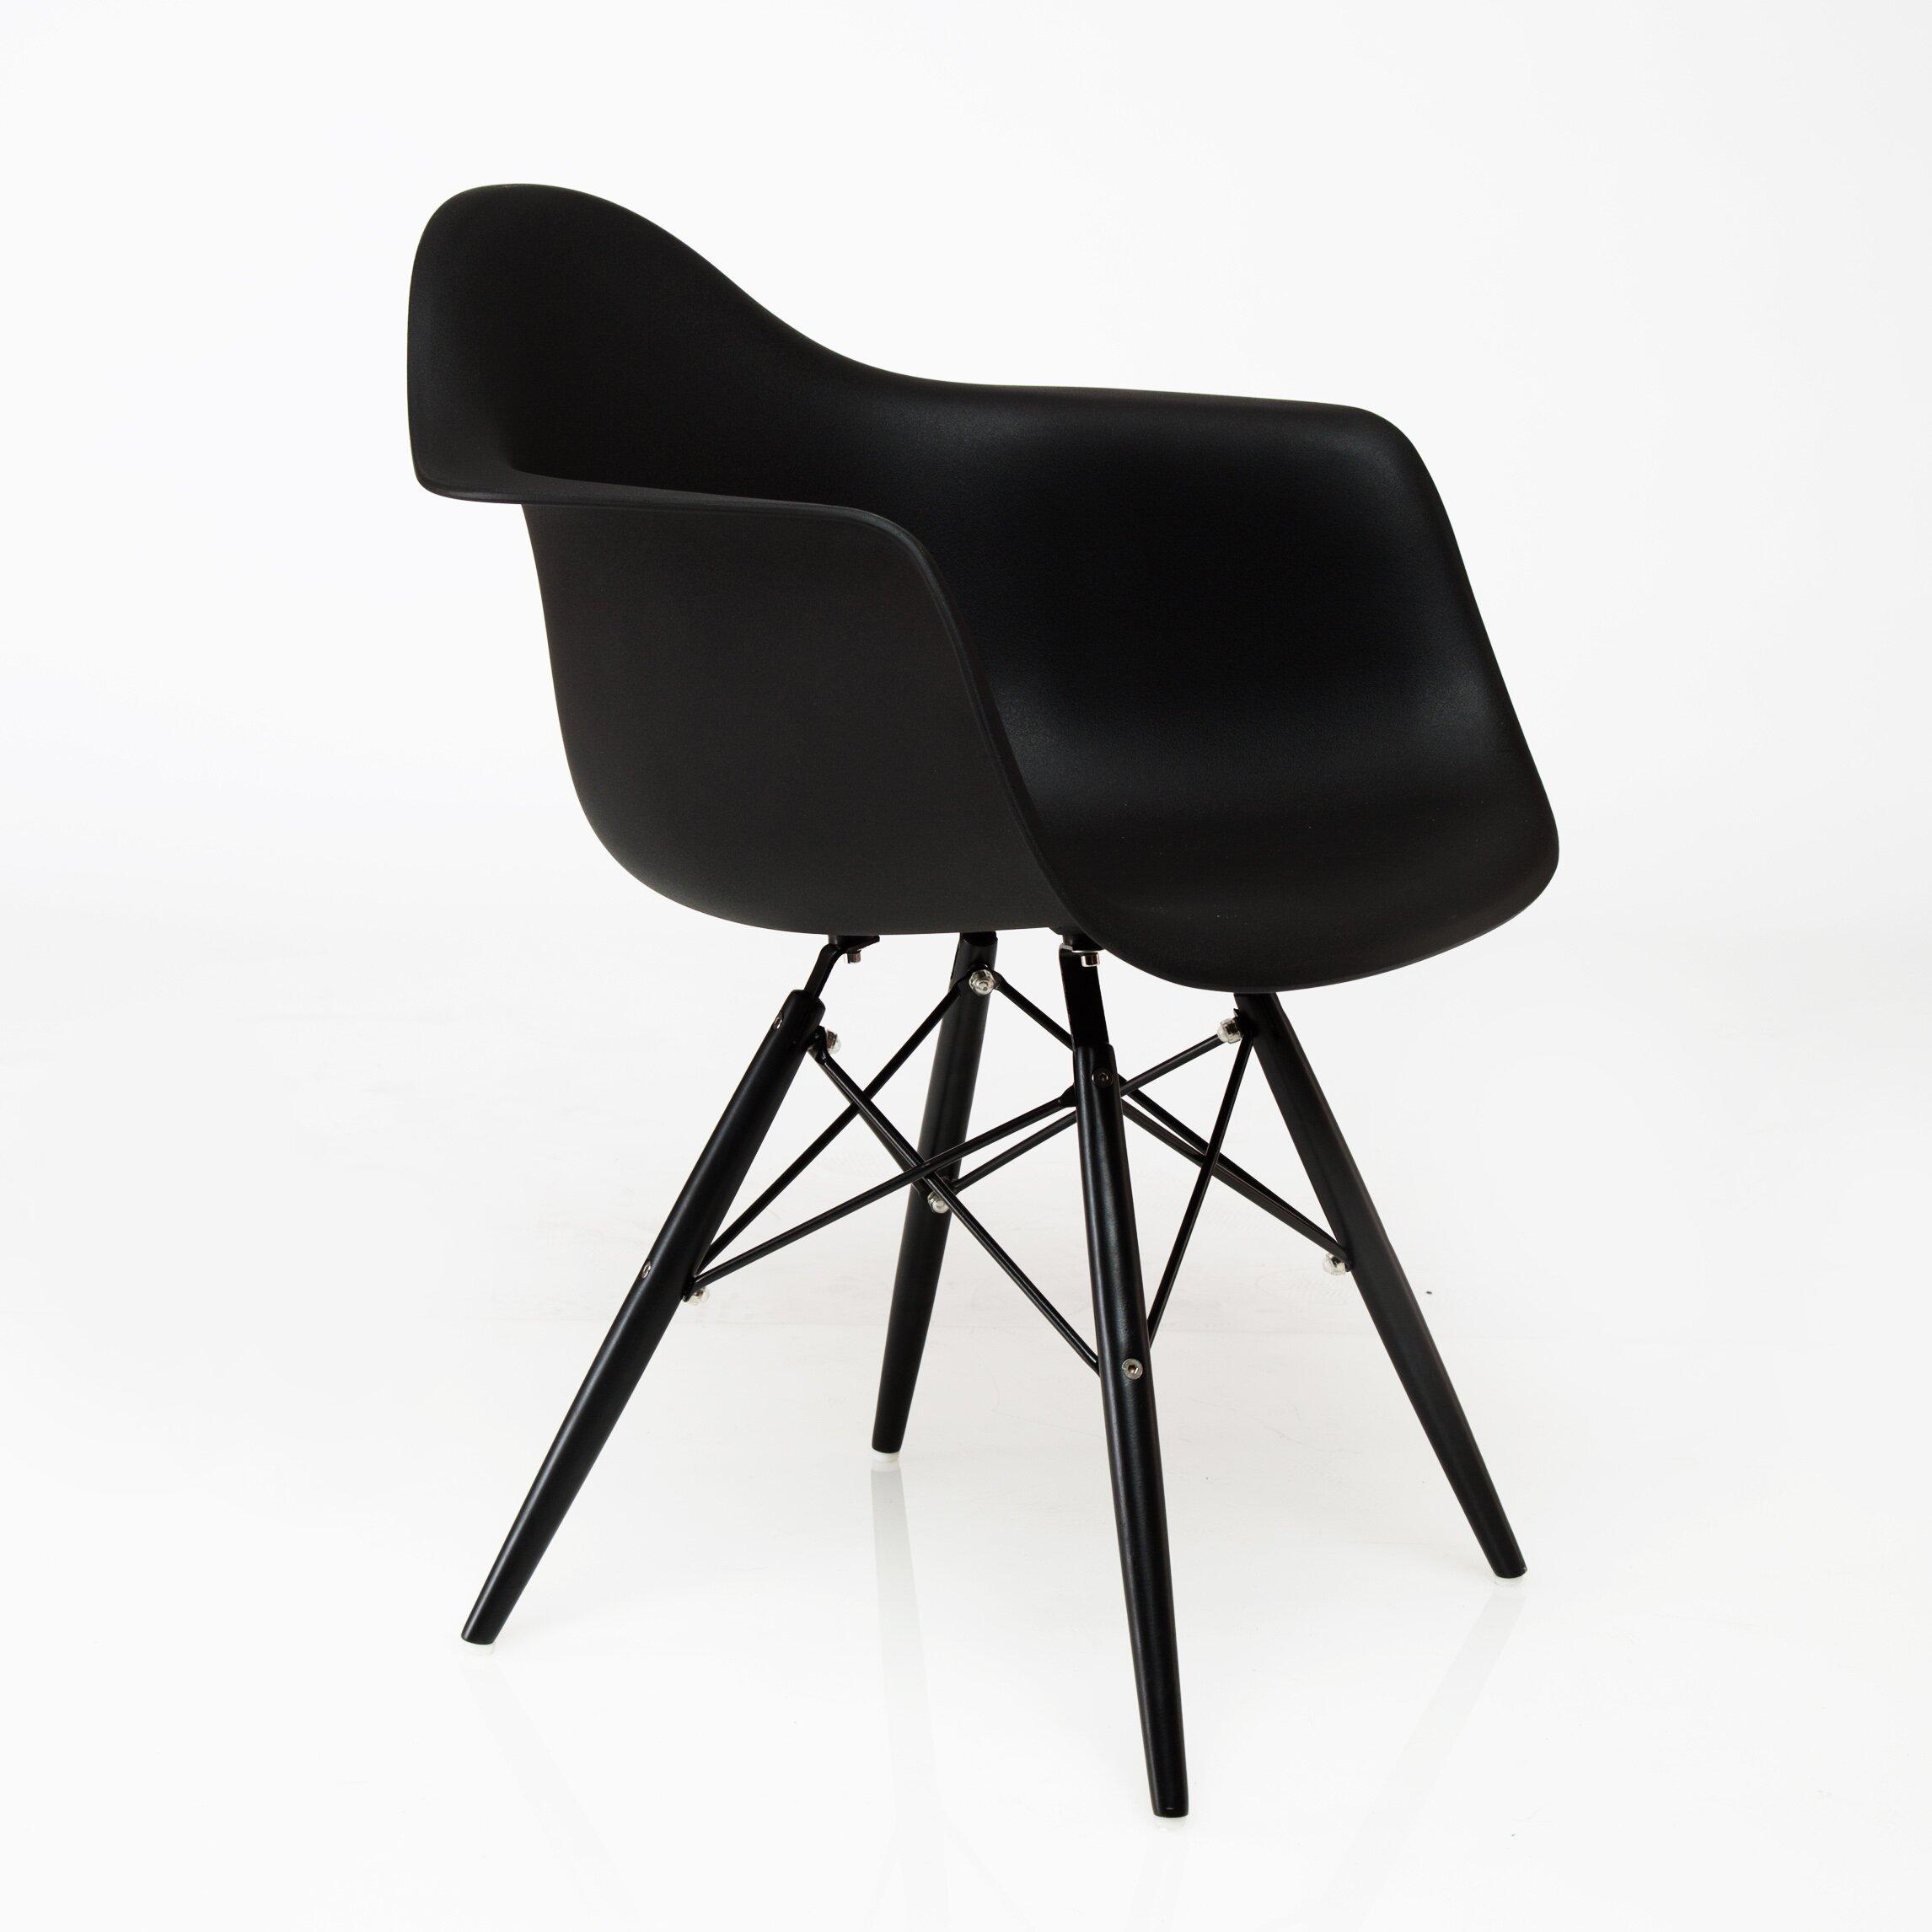 #6C685F23648888 Design Guild Banks Arm Chair Meest recente Designers Guild Bank 3101 pic 229222923101 Ontwerp